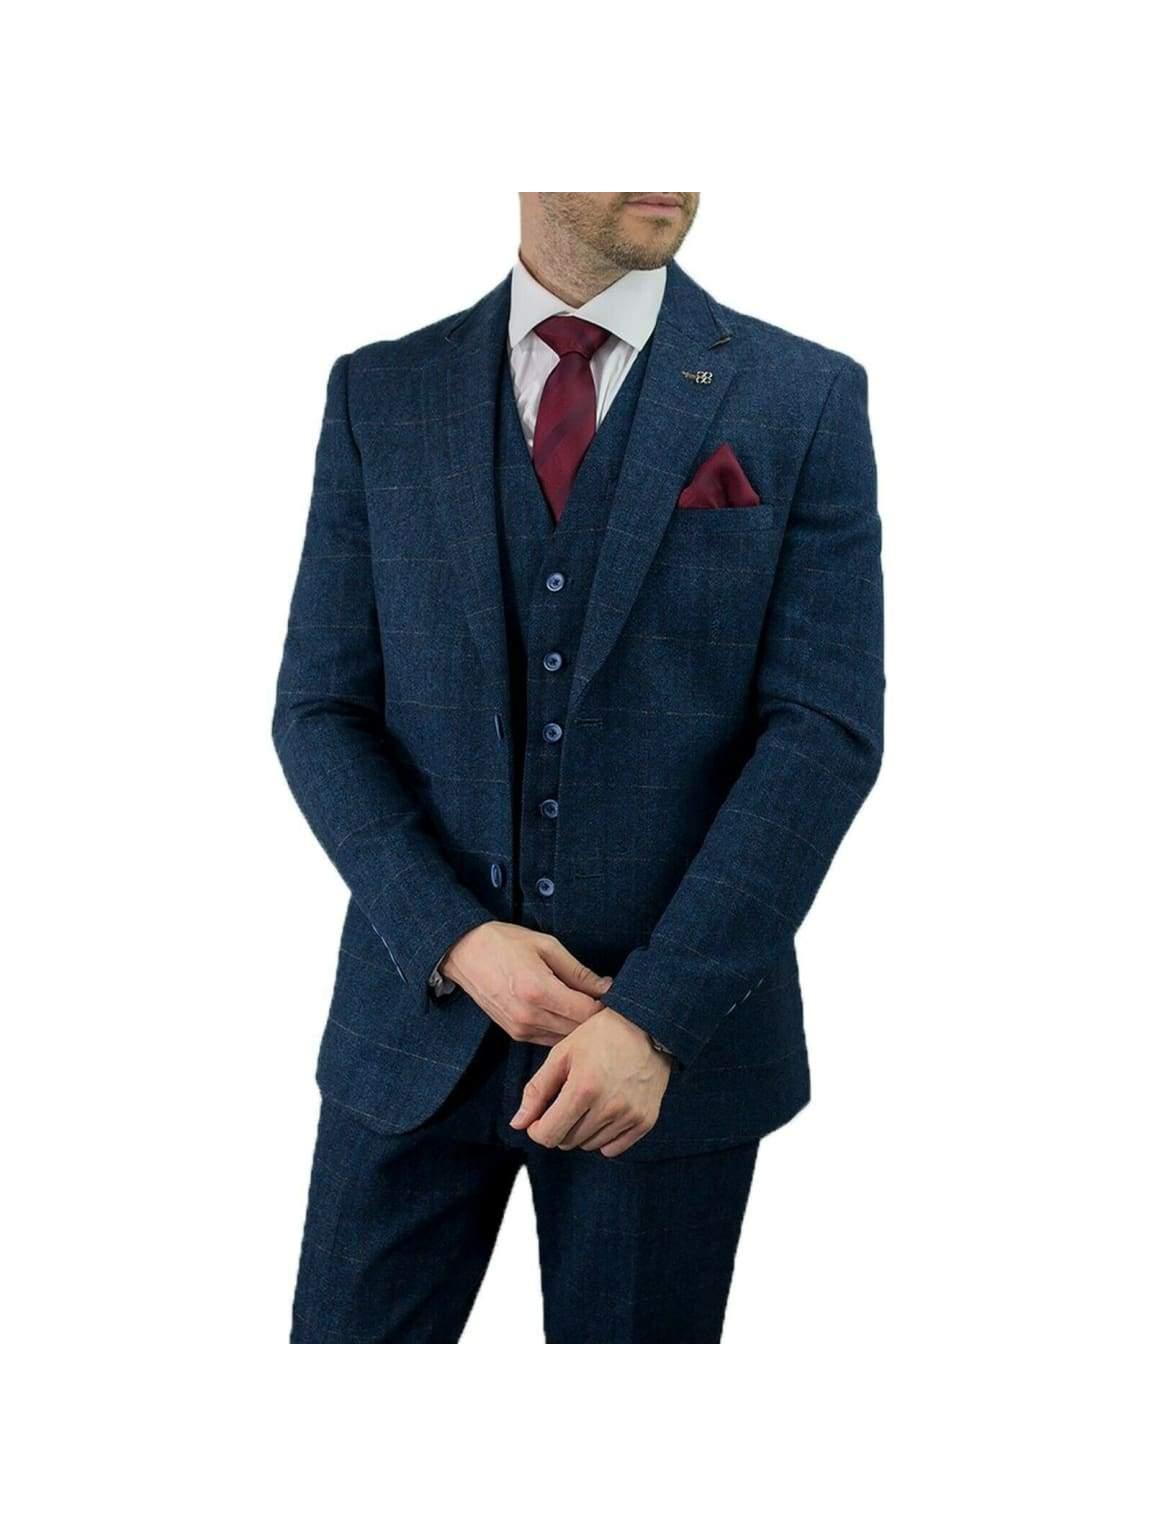 Cavani Carnegi Mens Blue Slim Fit tweed Check Blazer - 36R - Suit & Tailoring